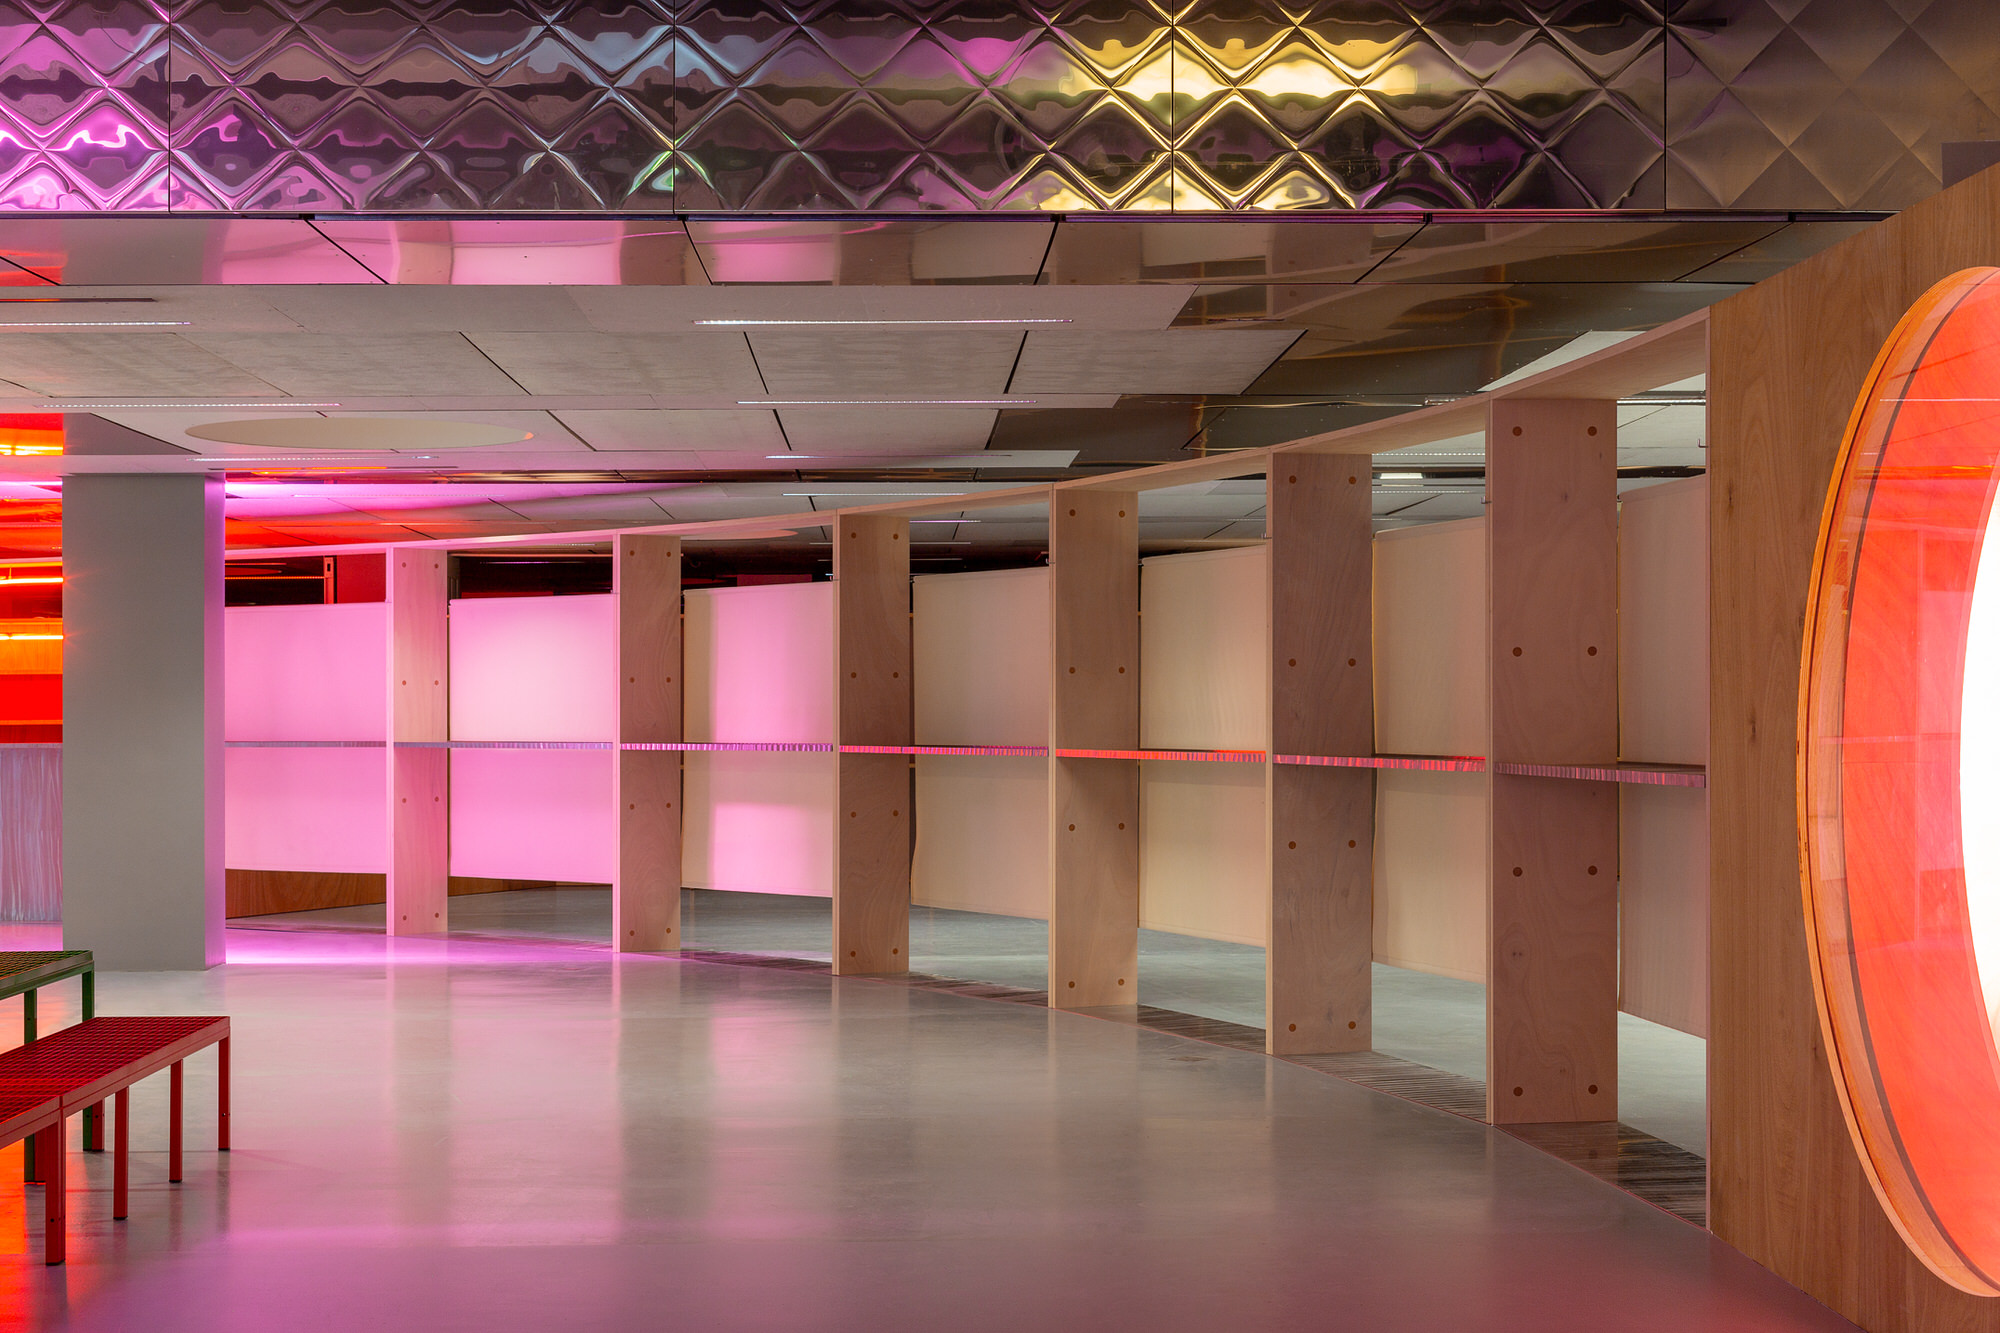 Jean Benoit Vetillard Architecture R+1 Gaite Lyrique Multipurpose Space Paris Photo Giaime Meloni Yellowtrace 02